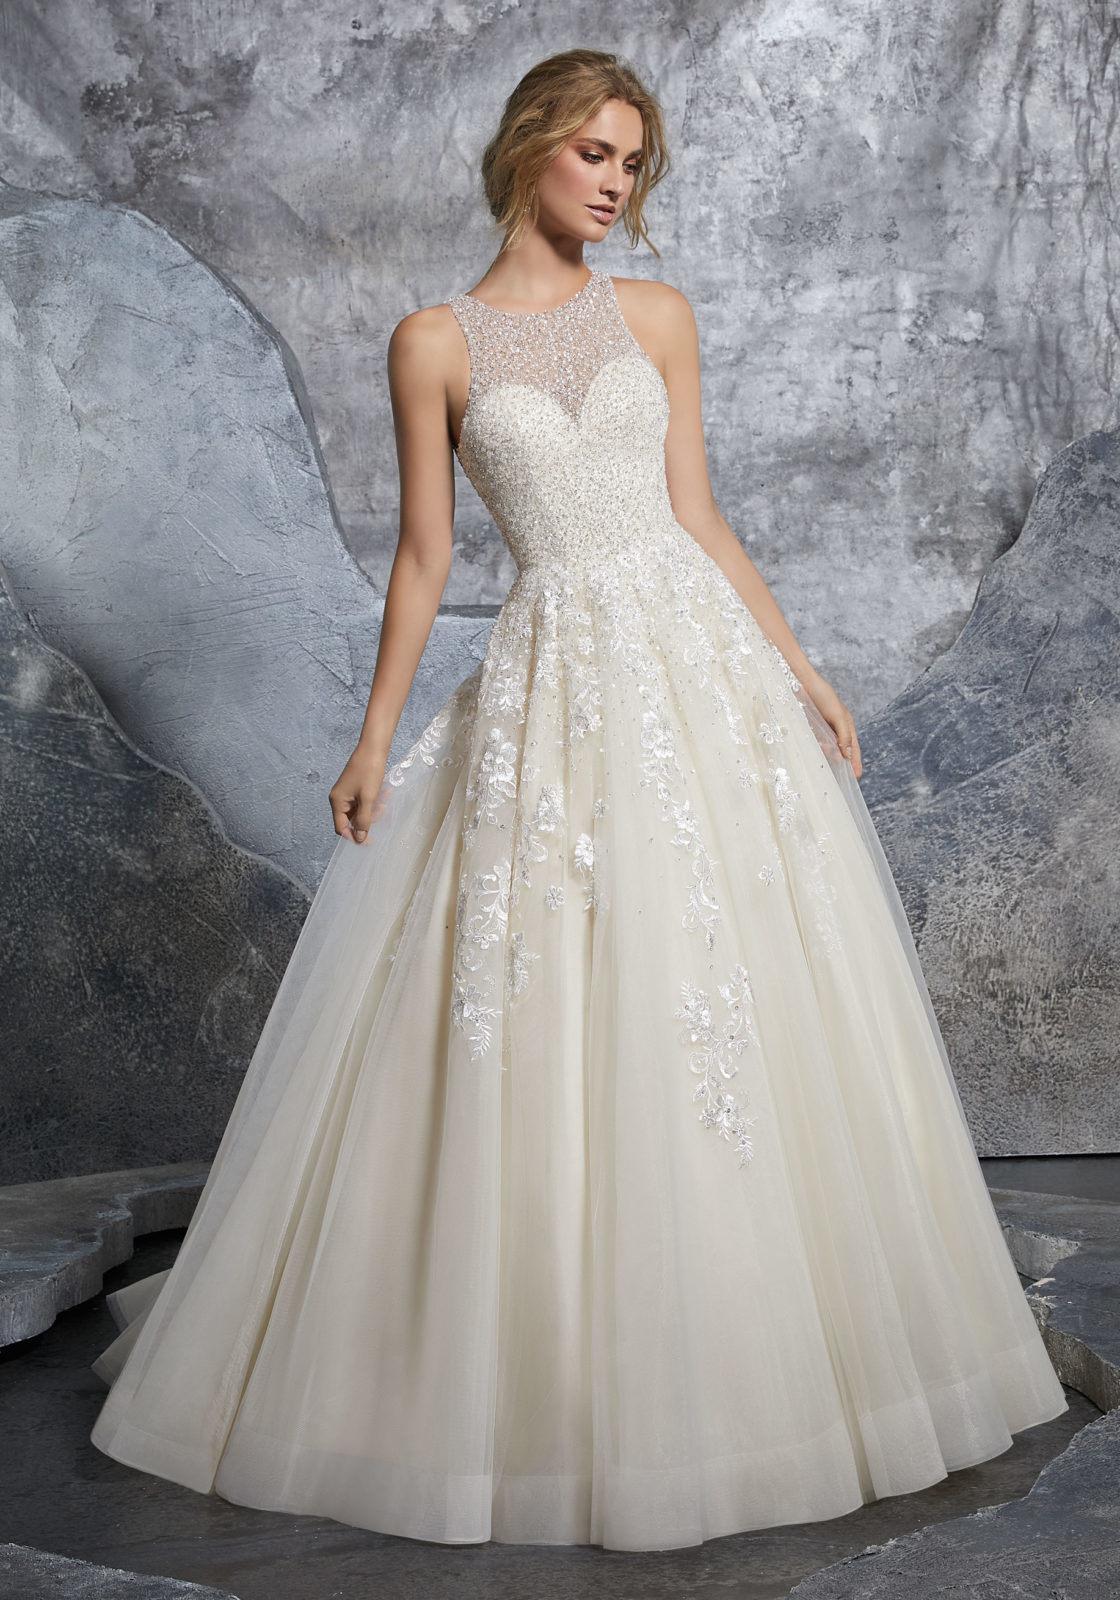 117262b7d1 China Princess Bridal Gown Beaded Appliqued Cream Tulle Beach Wedding Dress  M8215 - China Wedding Dress, Wedding Gown